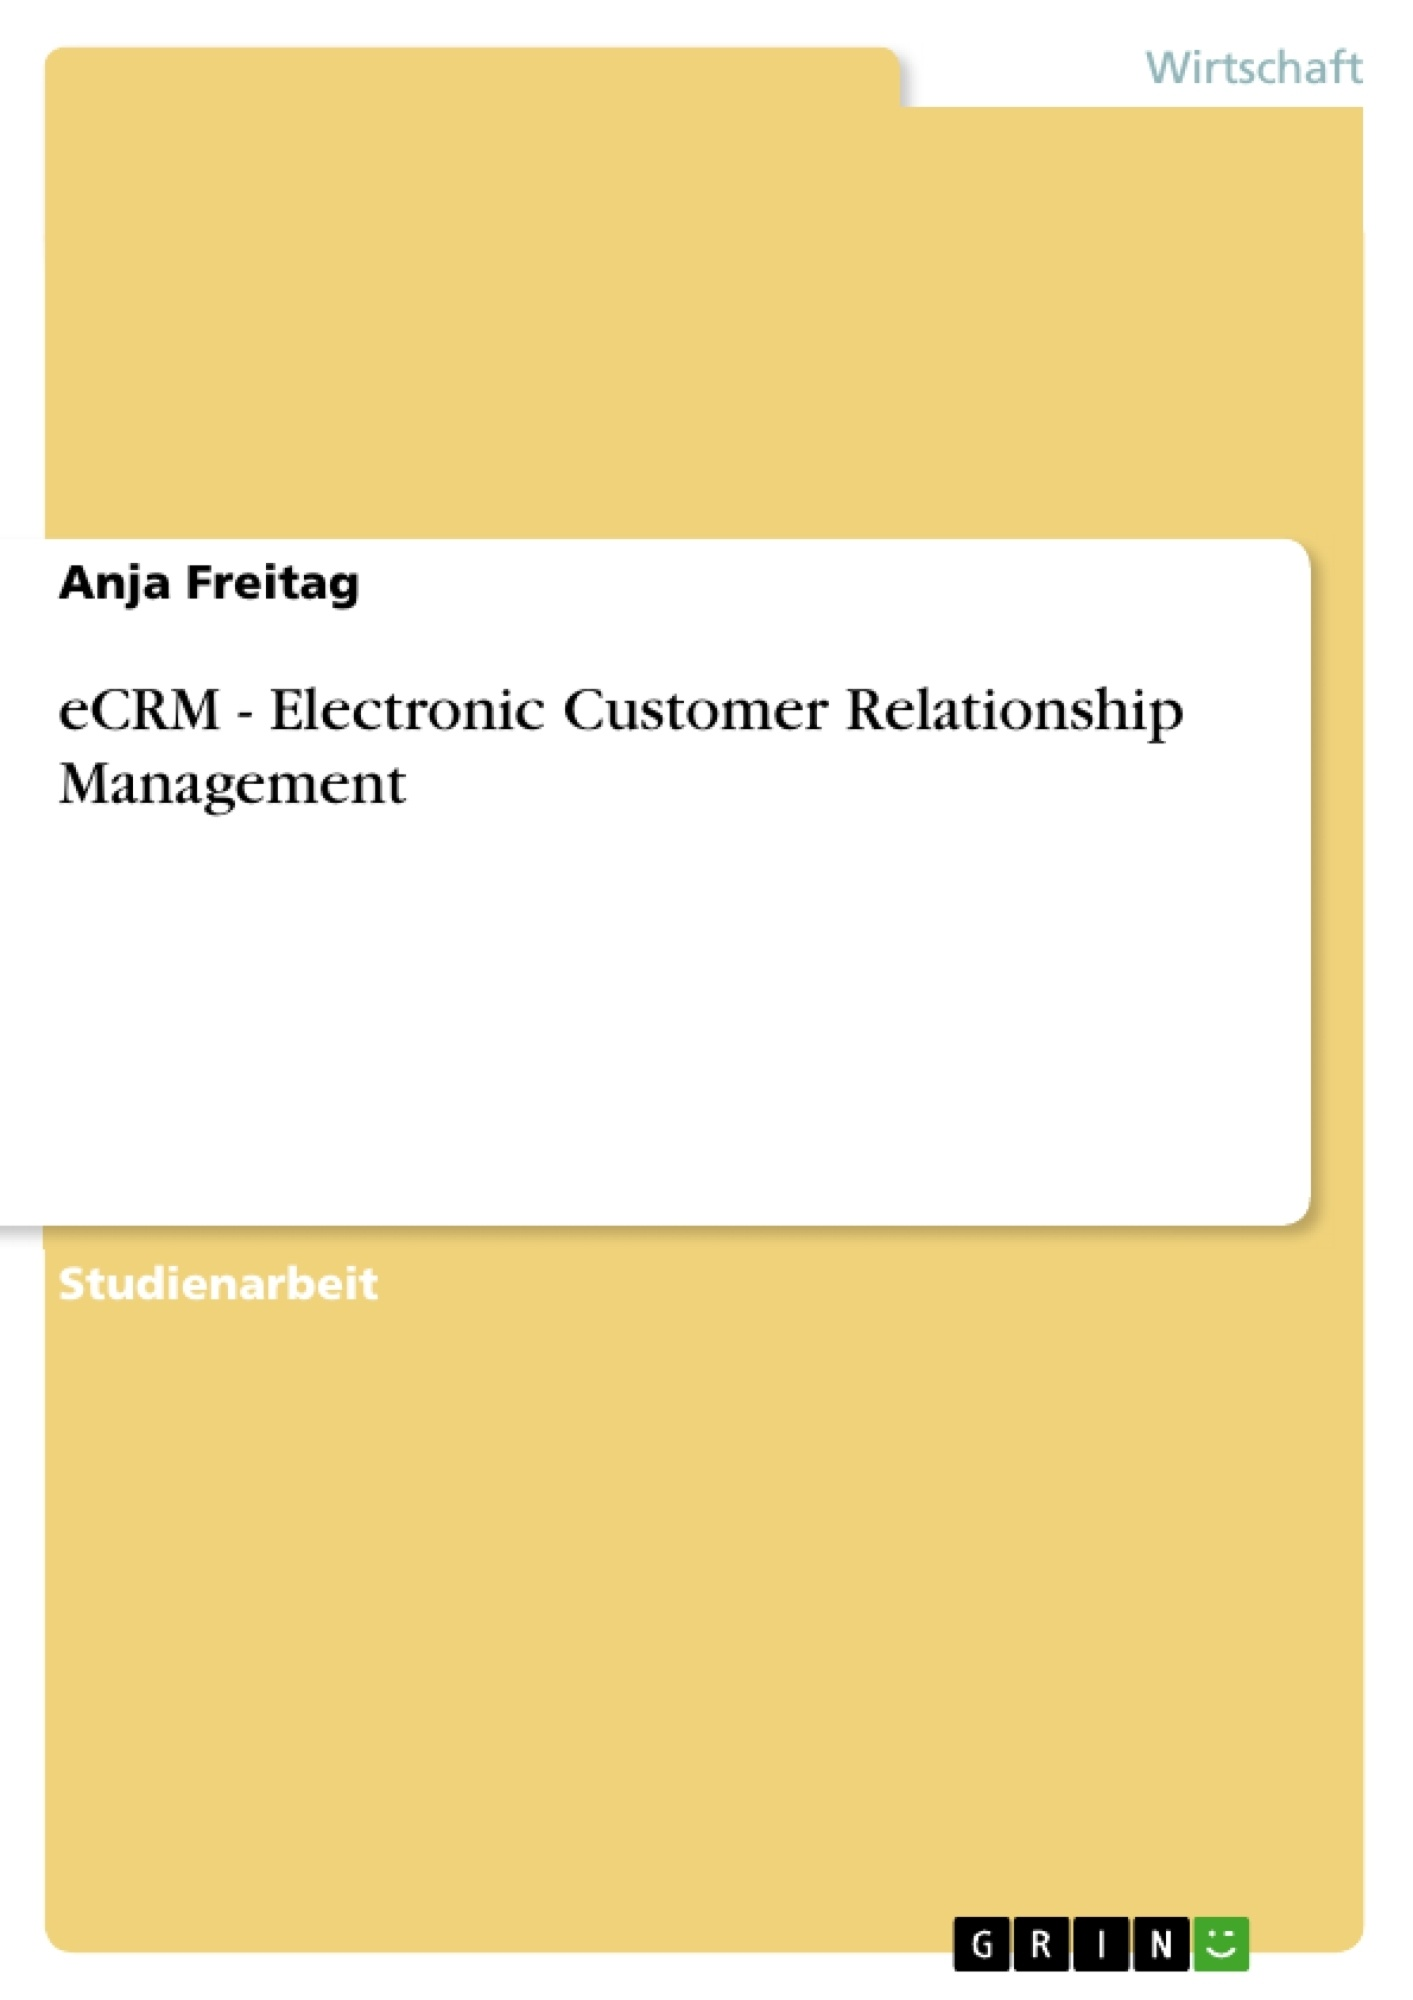 Titel: eCRM - Electronic Customer Relationship Management